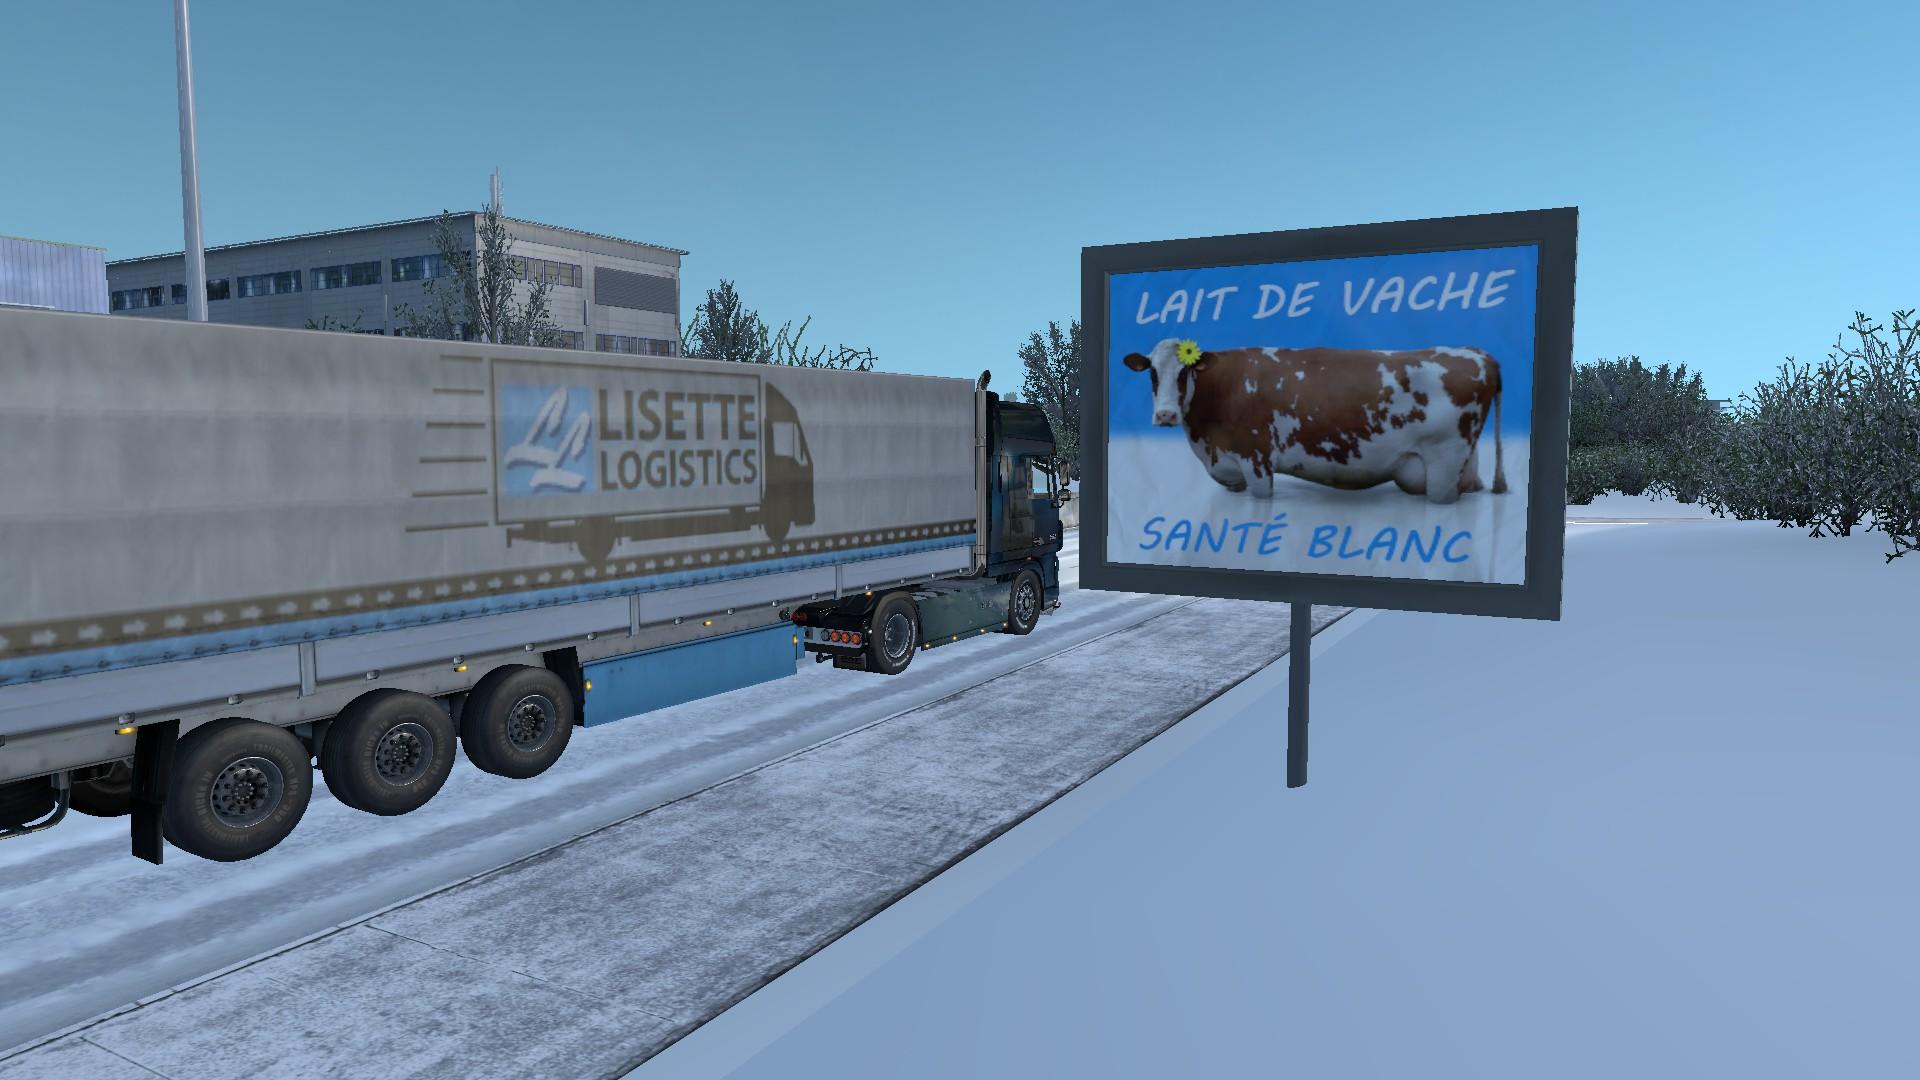 20180119210843_1.jpg - Euro Truck Simulator 2